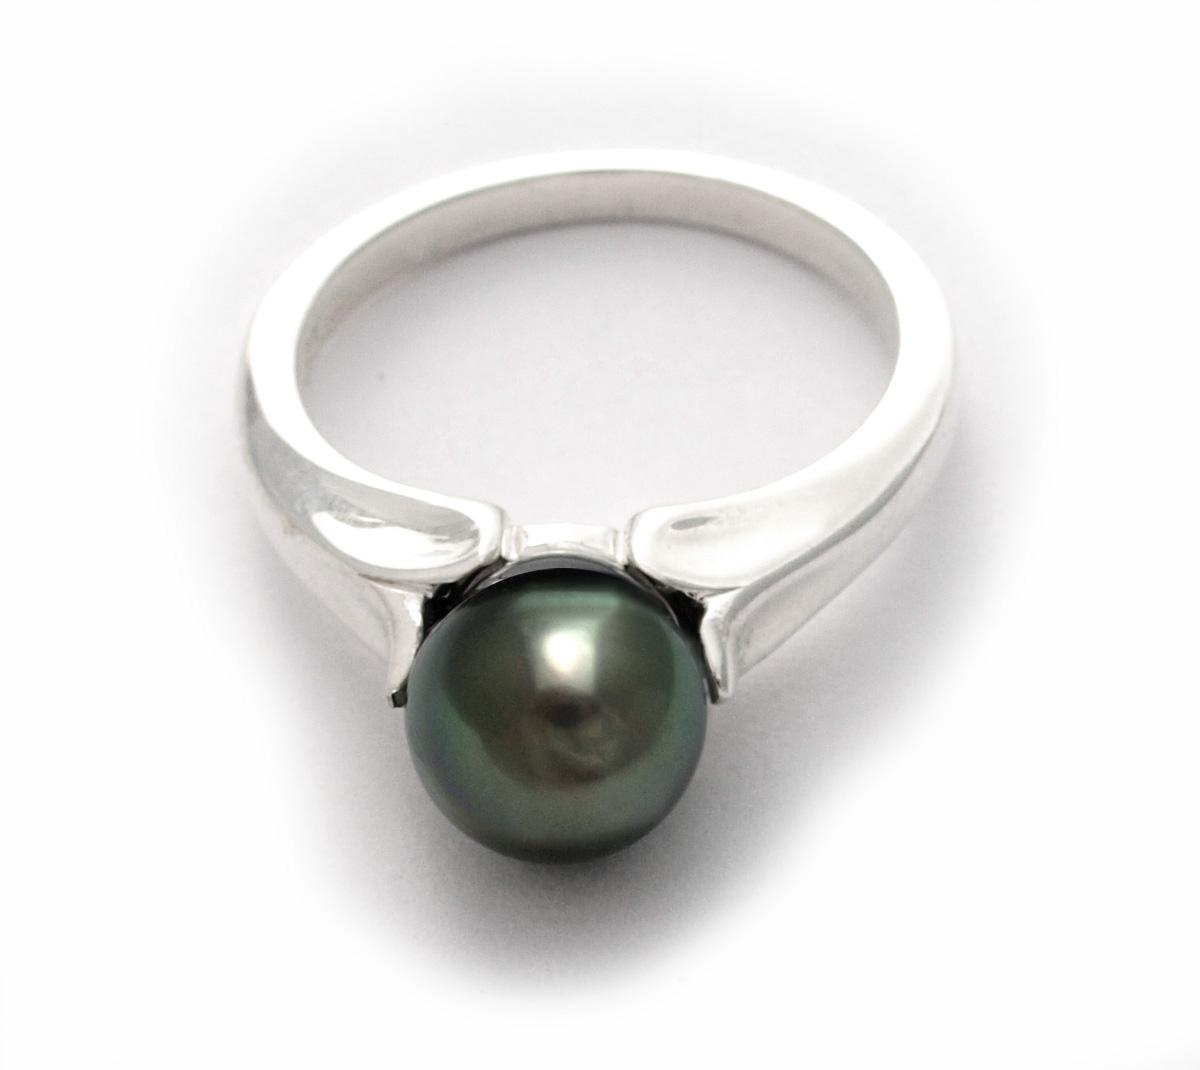 Tahitian Pearl Ring 78mm Sterling Silver $154 View Tahitian Pearl Ring